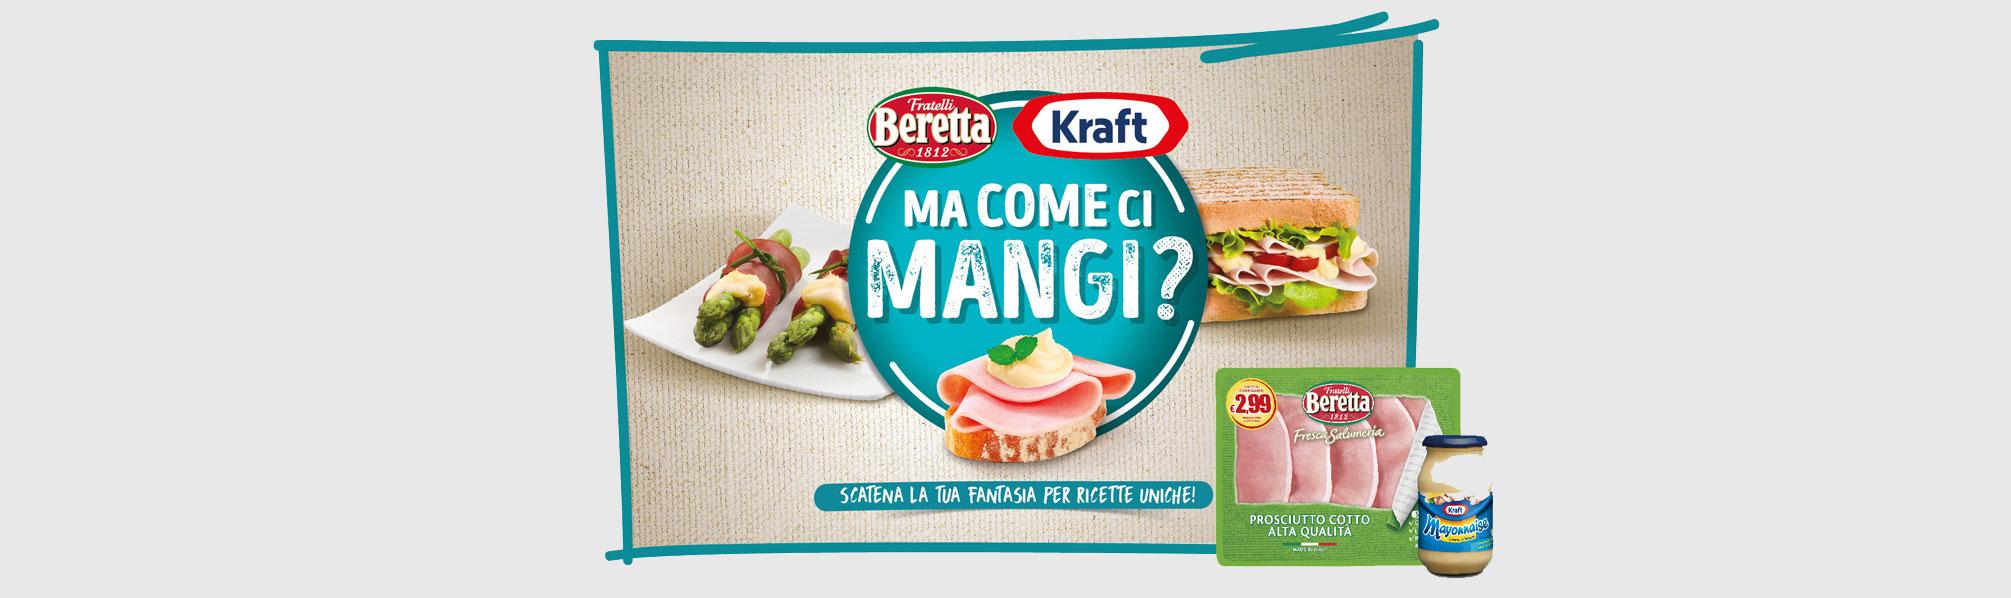 banner-Beretta-Kraft.jpg